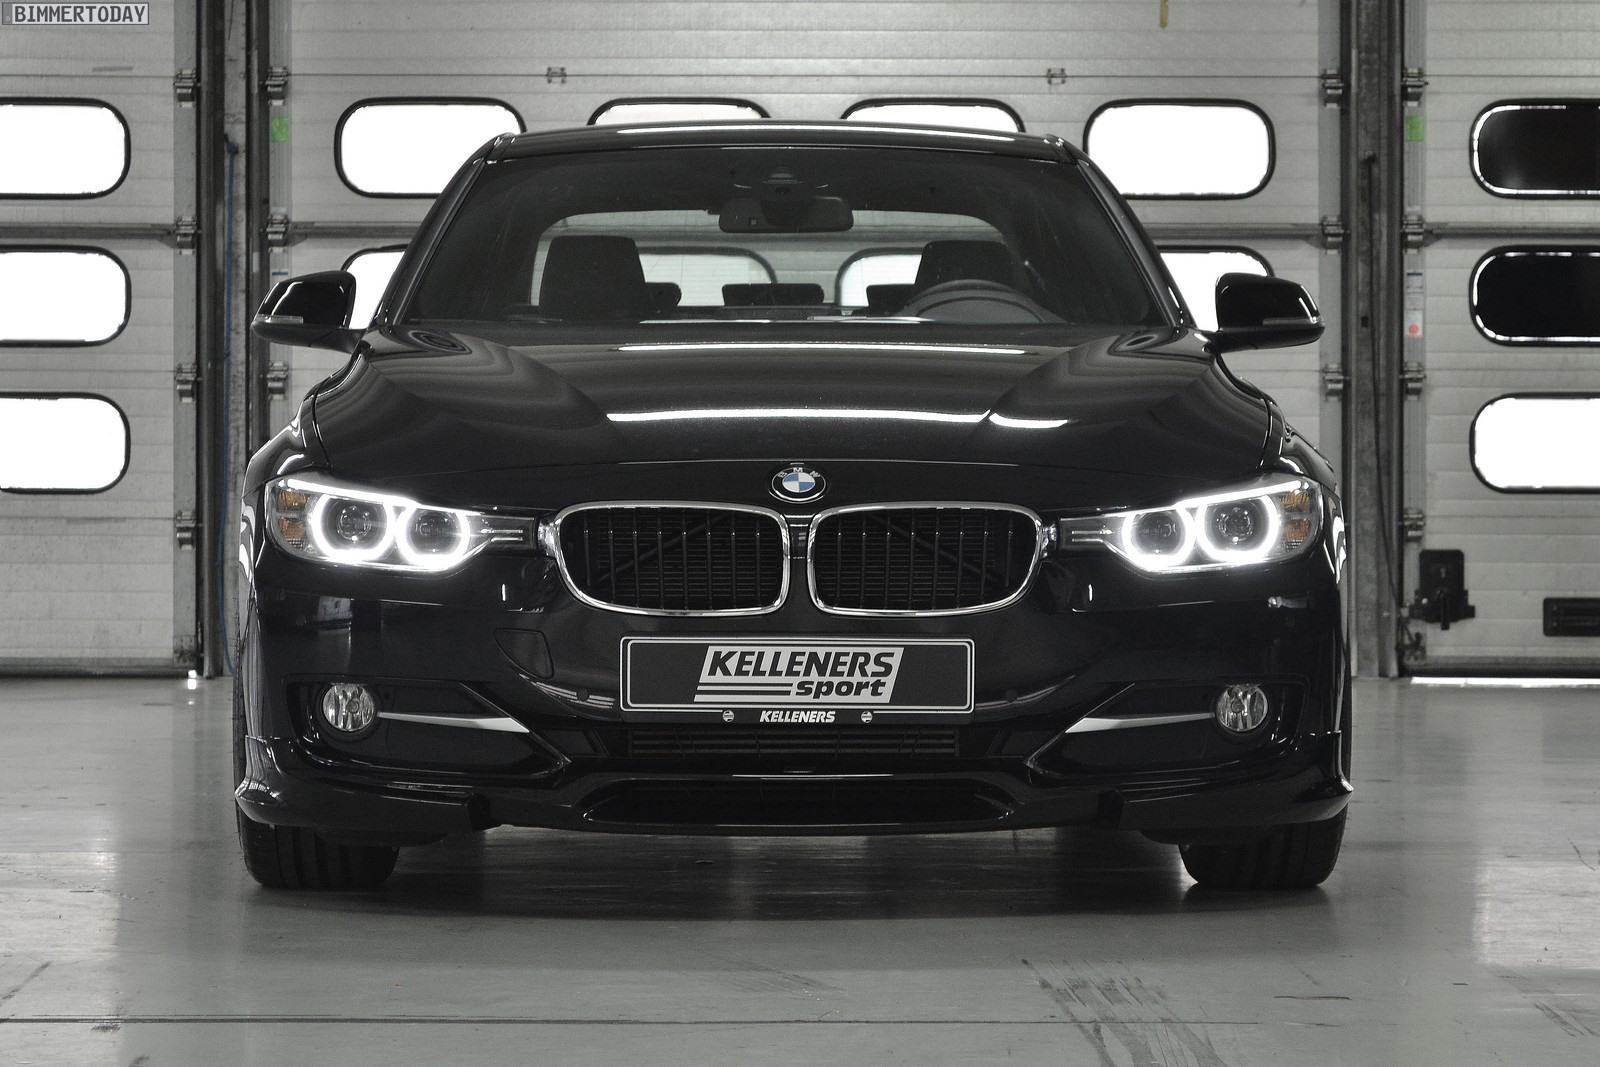 BMW 3er F30 Tuning Kelleners Sport 2012 012